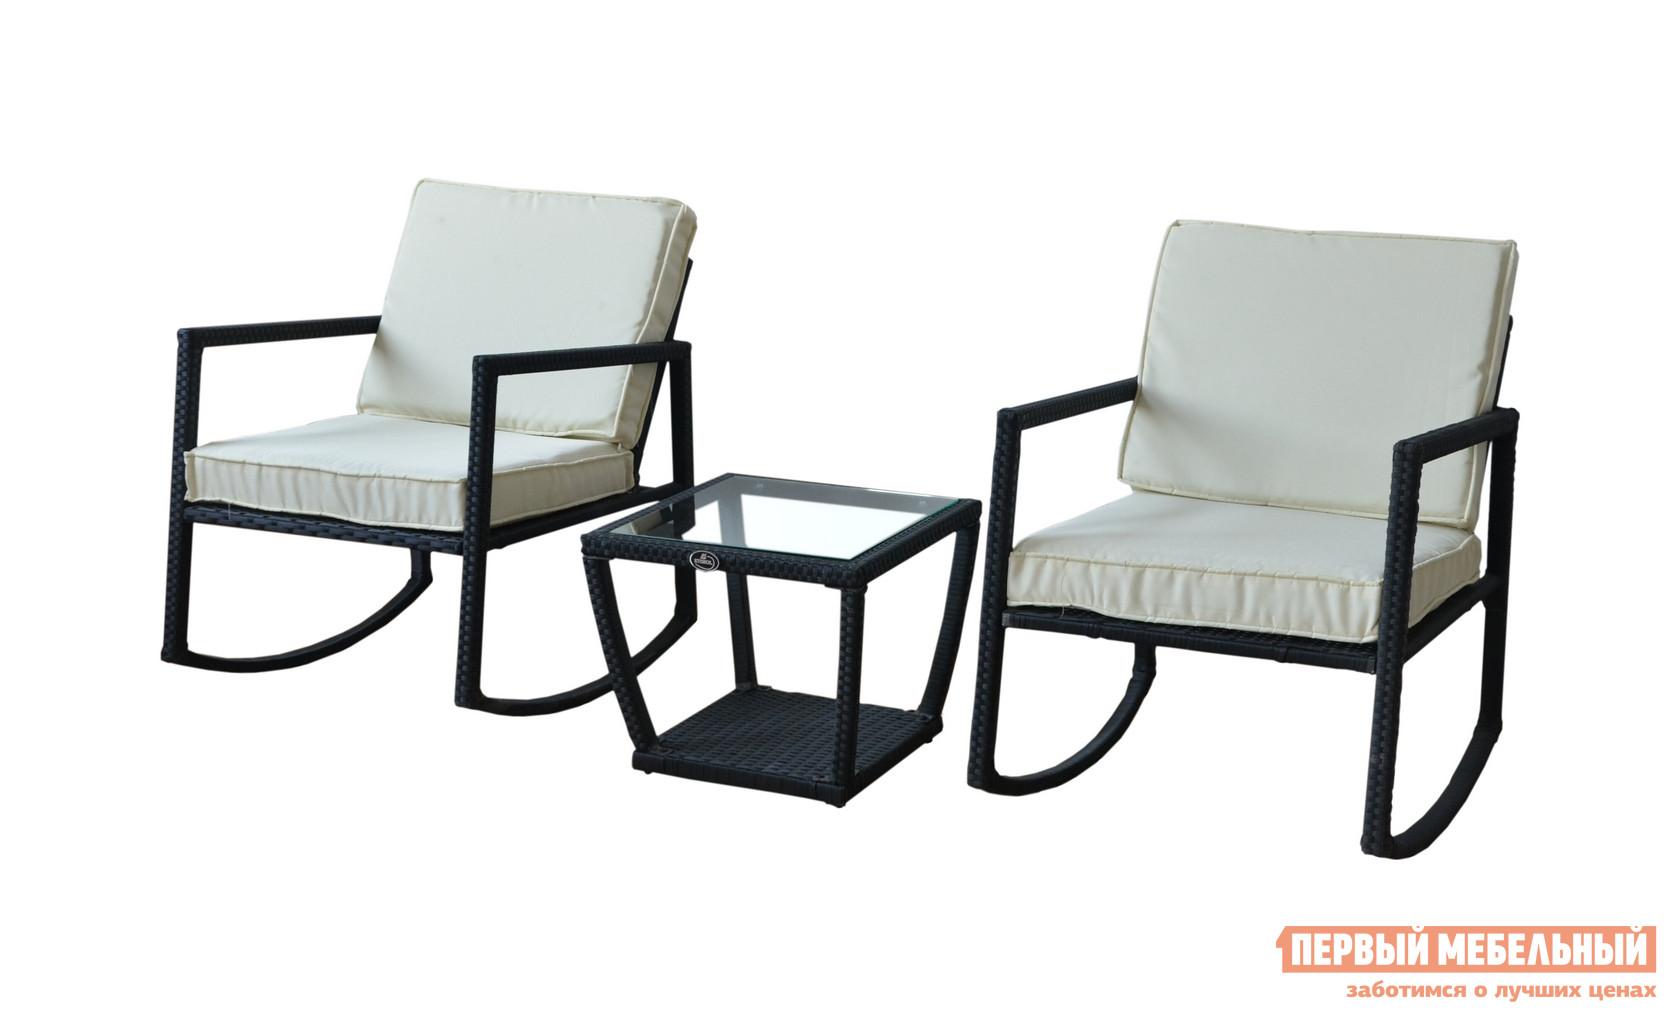 Комплект плетеной мебели Kvimol KM-0320